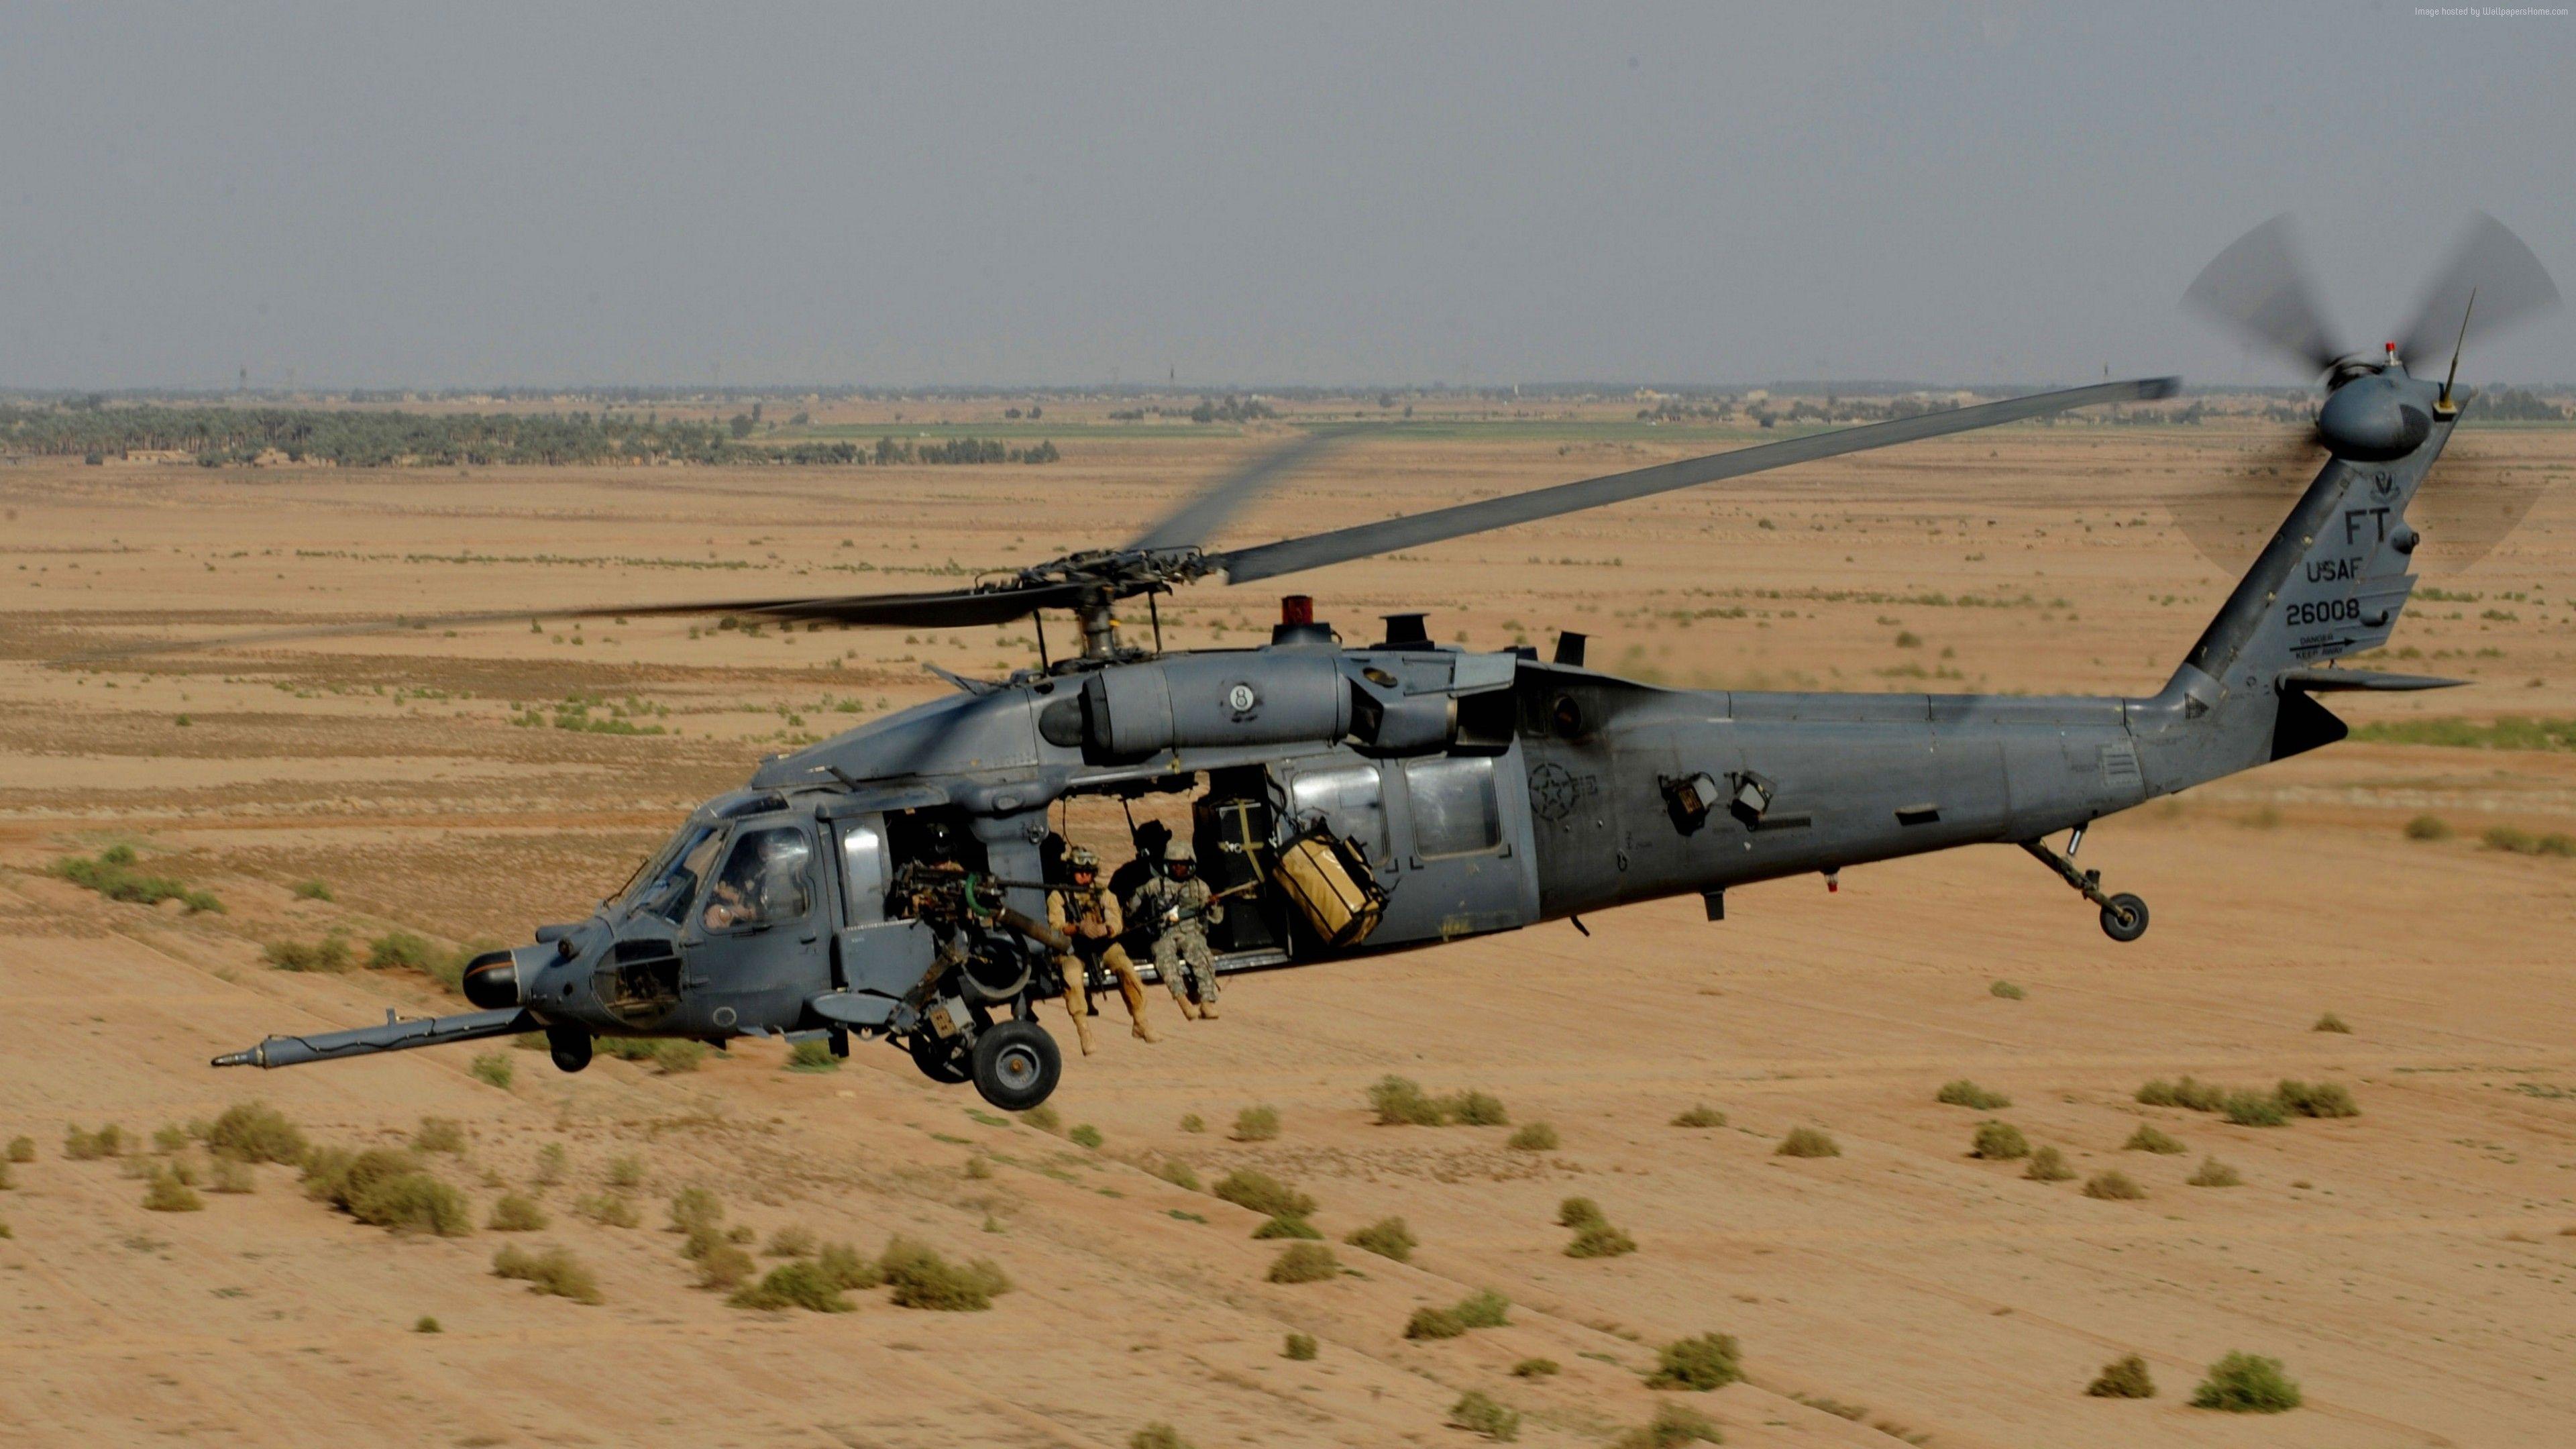 Sikorsky UH-60 Black Hawk | Вертолеты, Воздушное судно ...